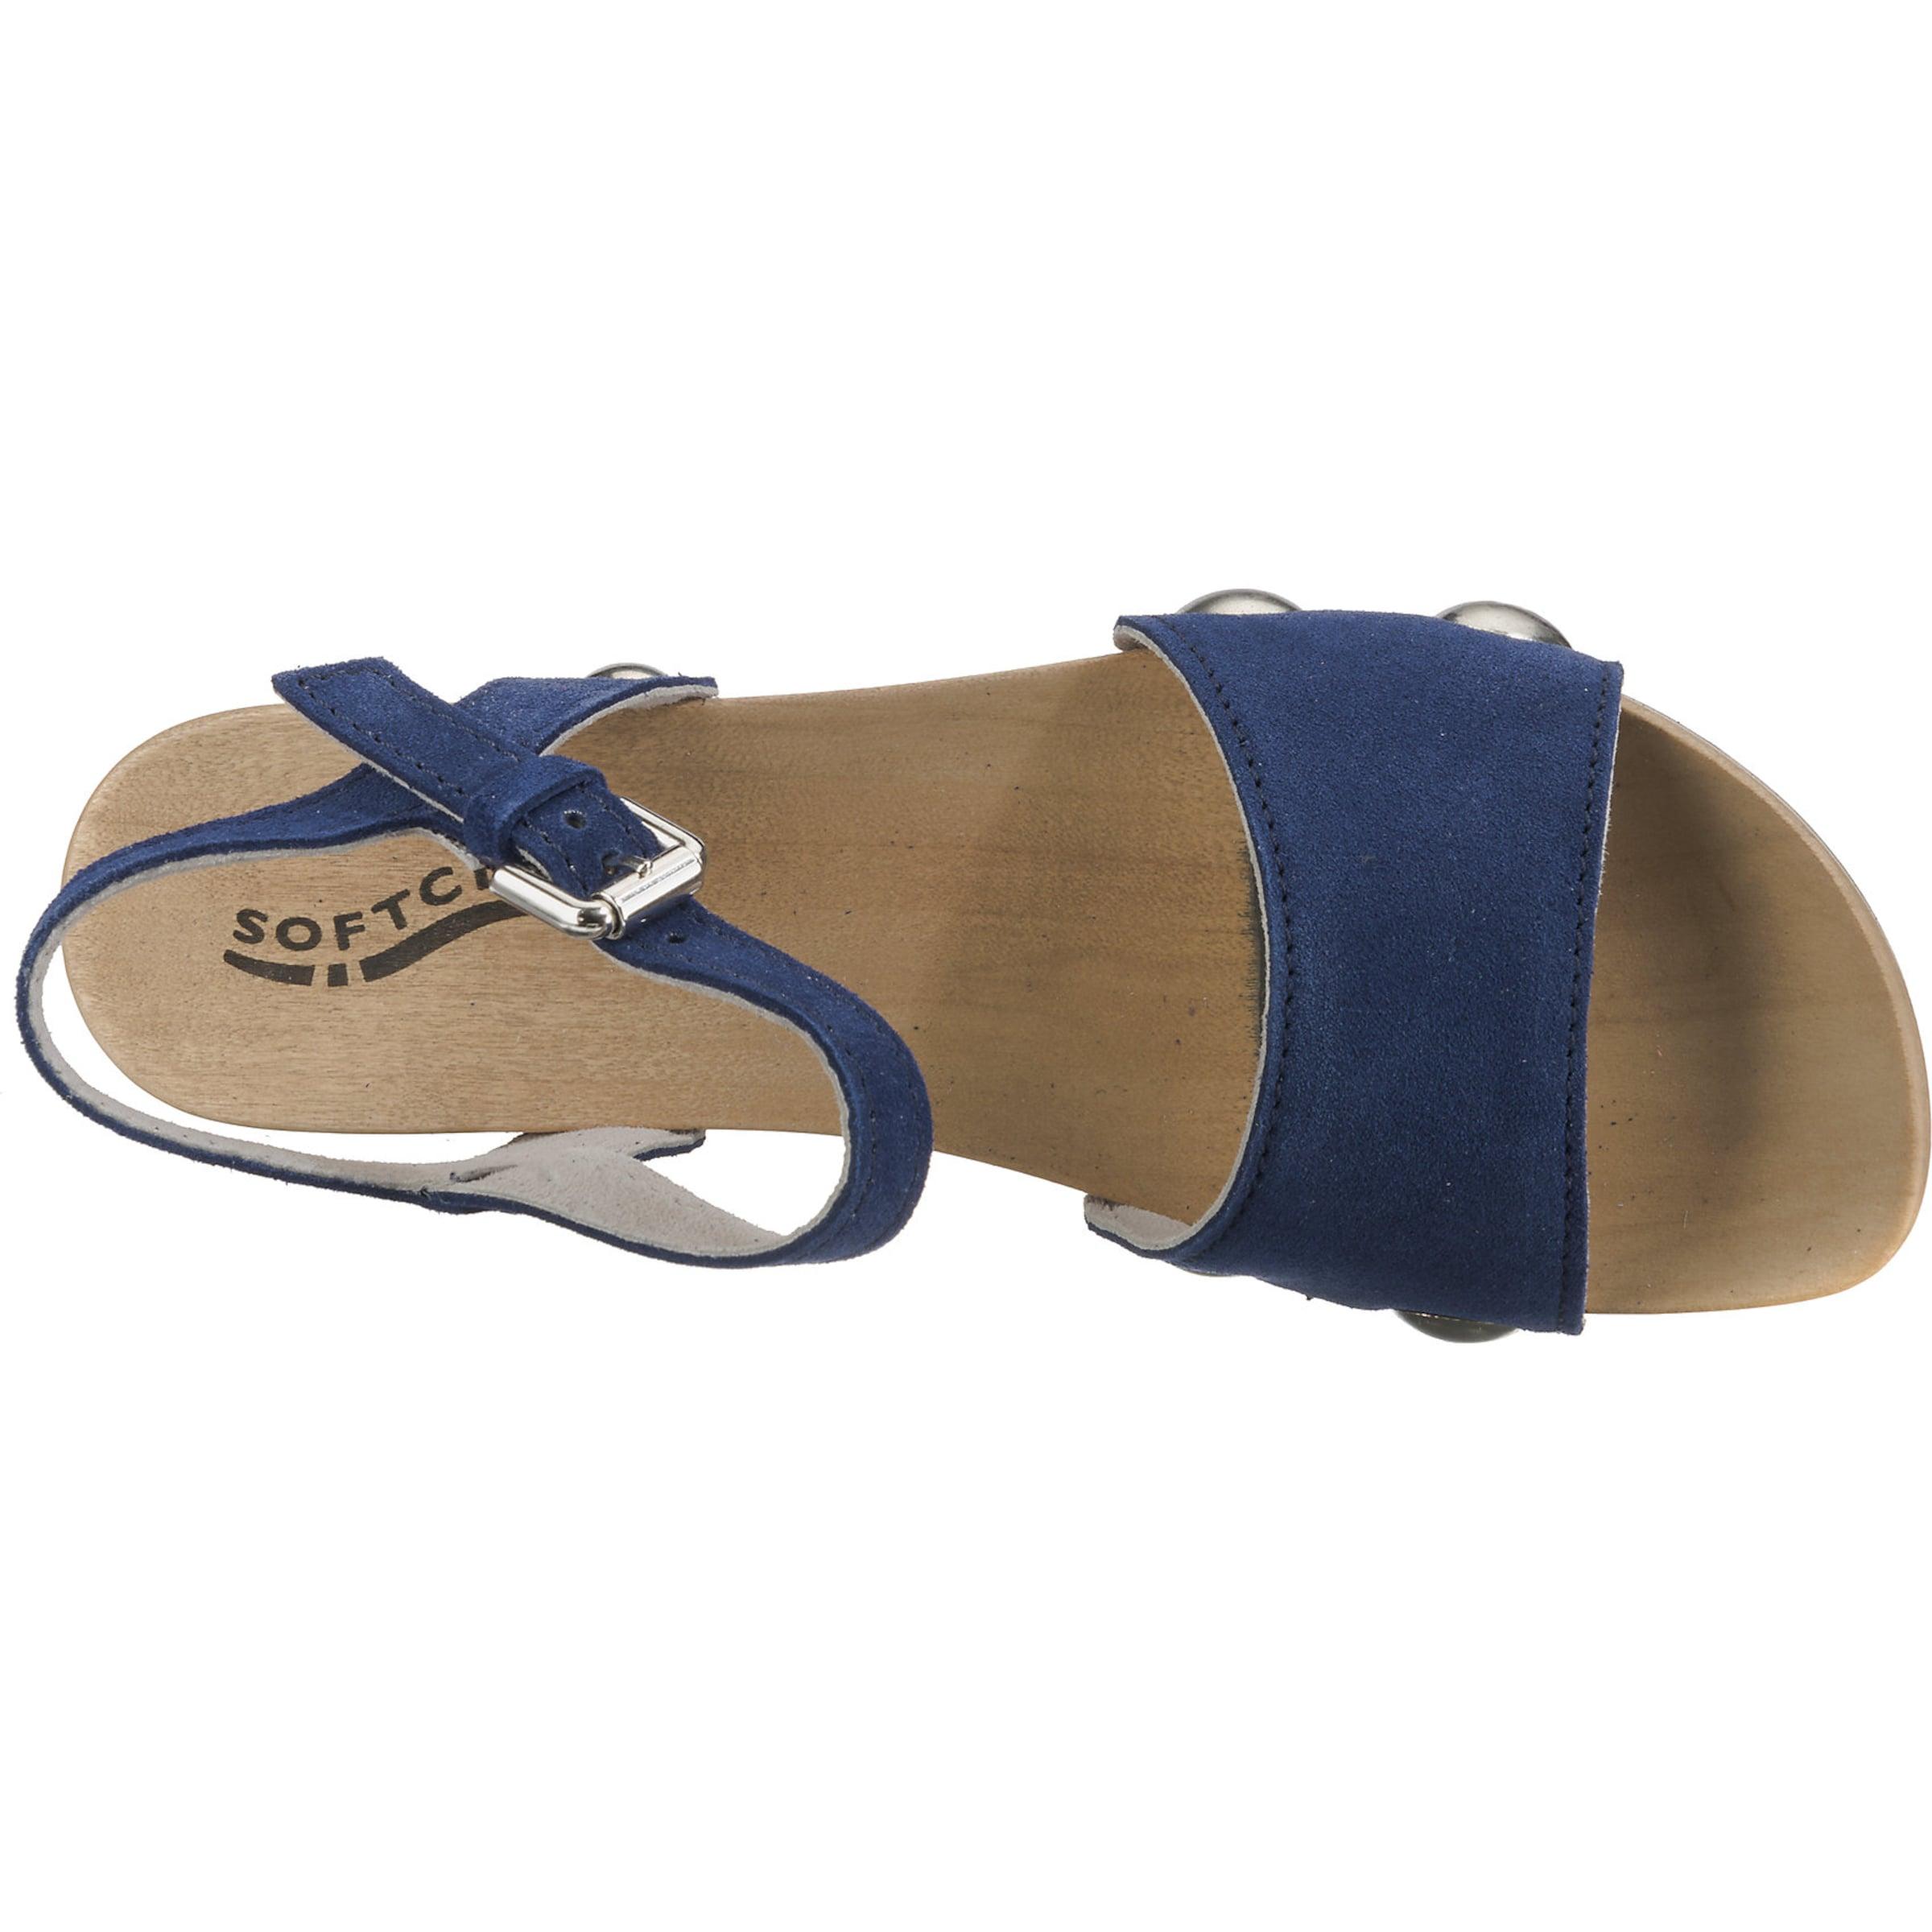 'penny' Plateau Softclox sandaletten In Blau 3AR4j5Lq